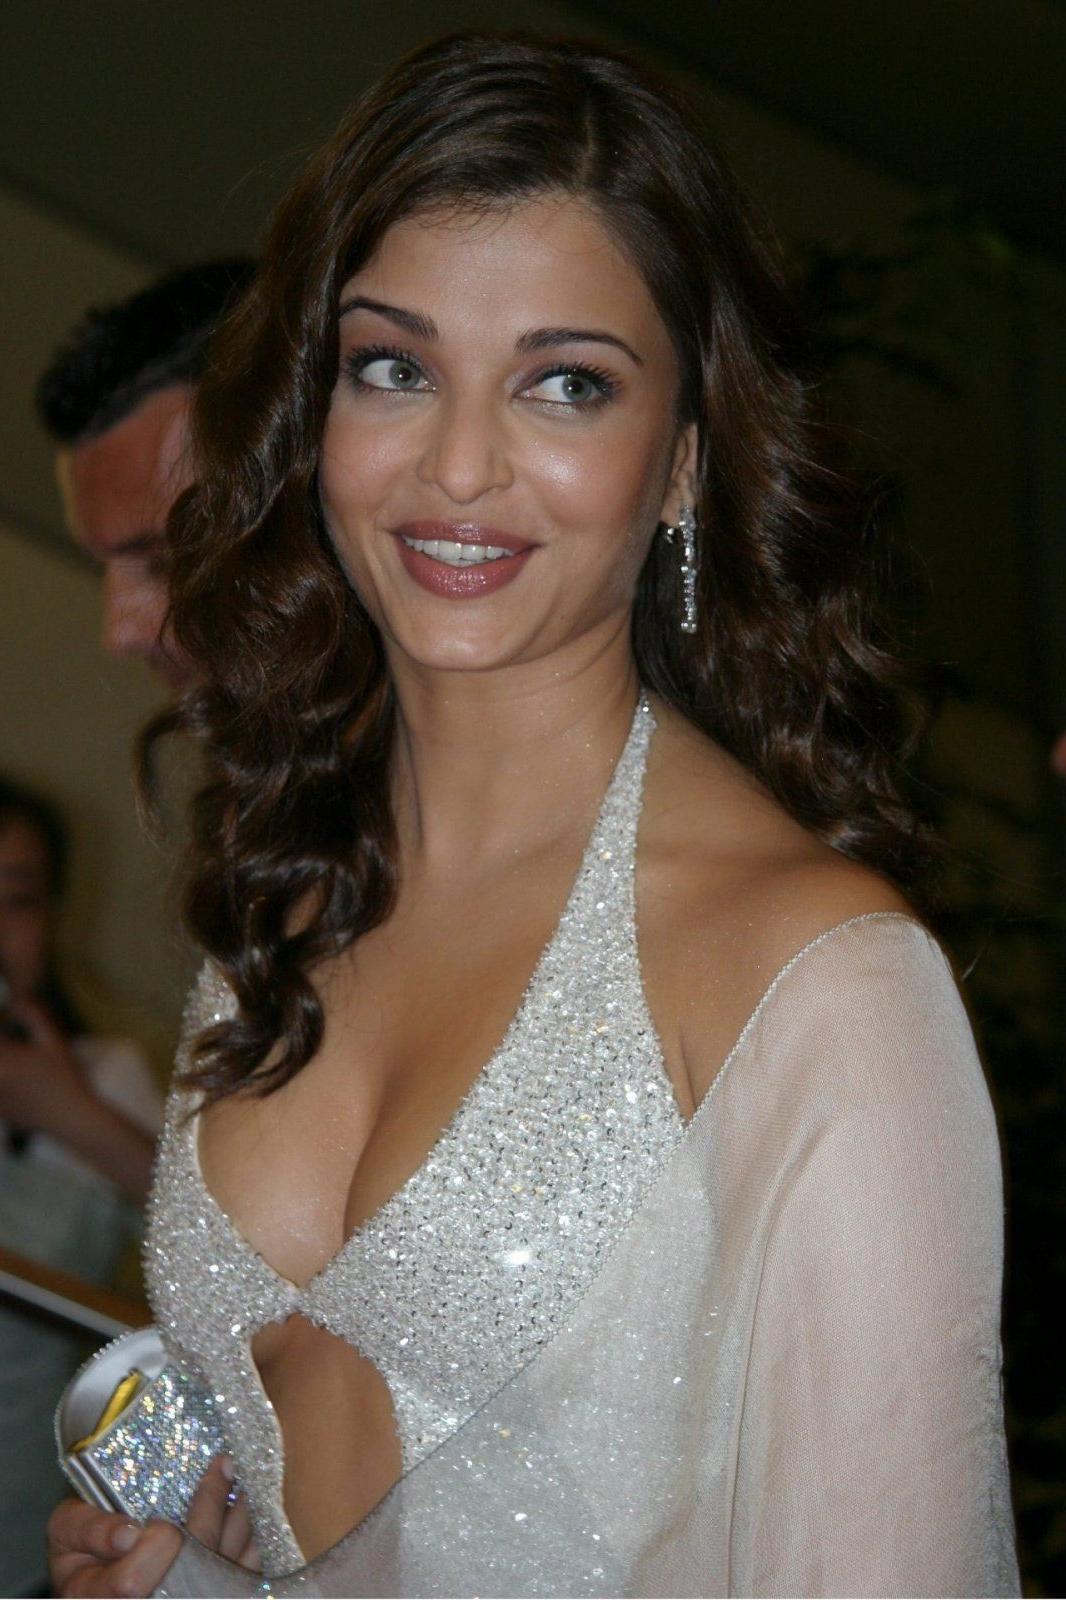 Vineeta's blog: wedding rose. Centrepiece 1. Price: S 25 ...